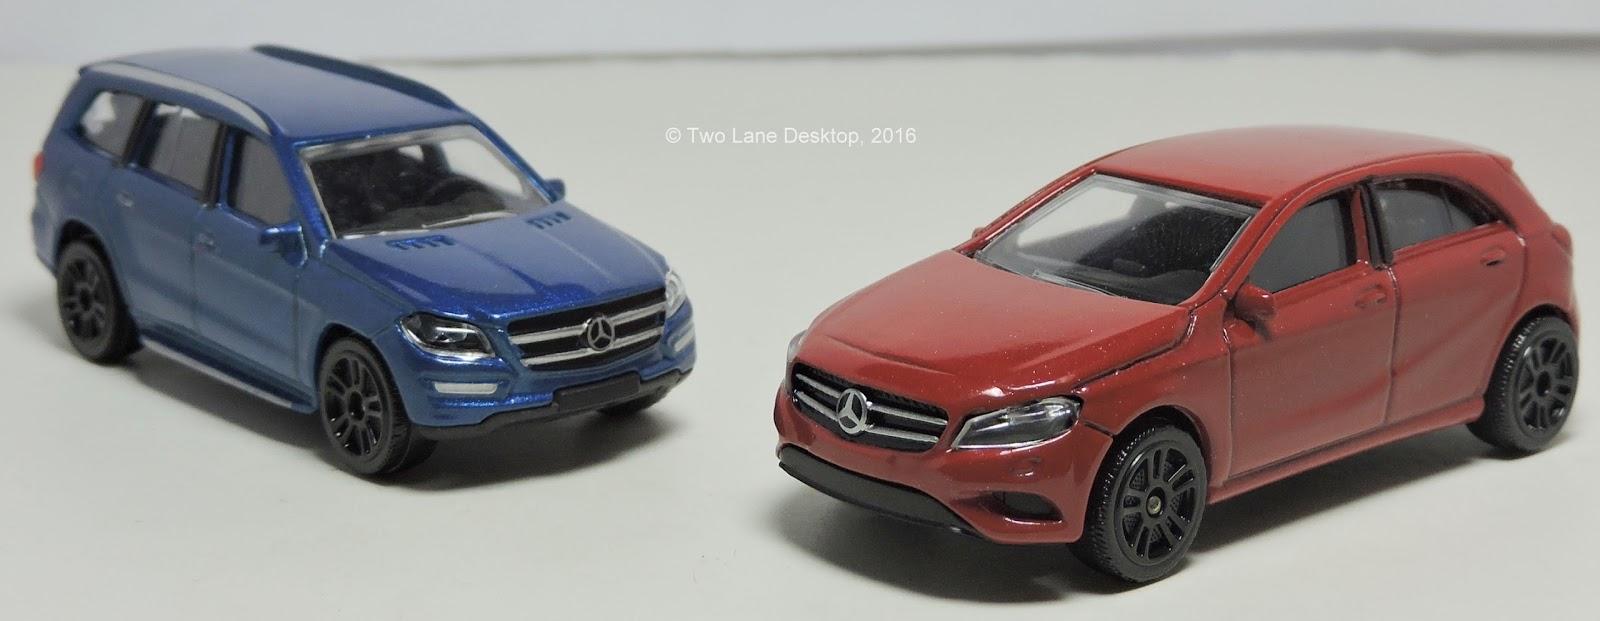 Two Lane Desktop Majorette Mercedes Benz A Class And Gl Suv